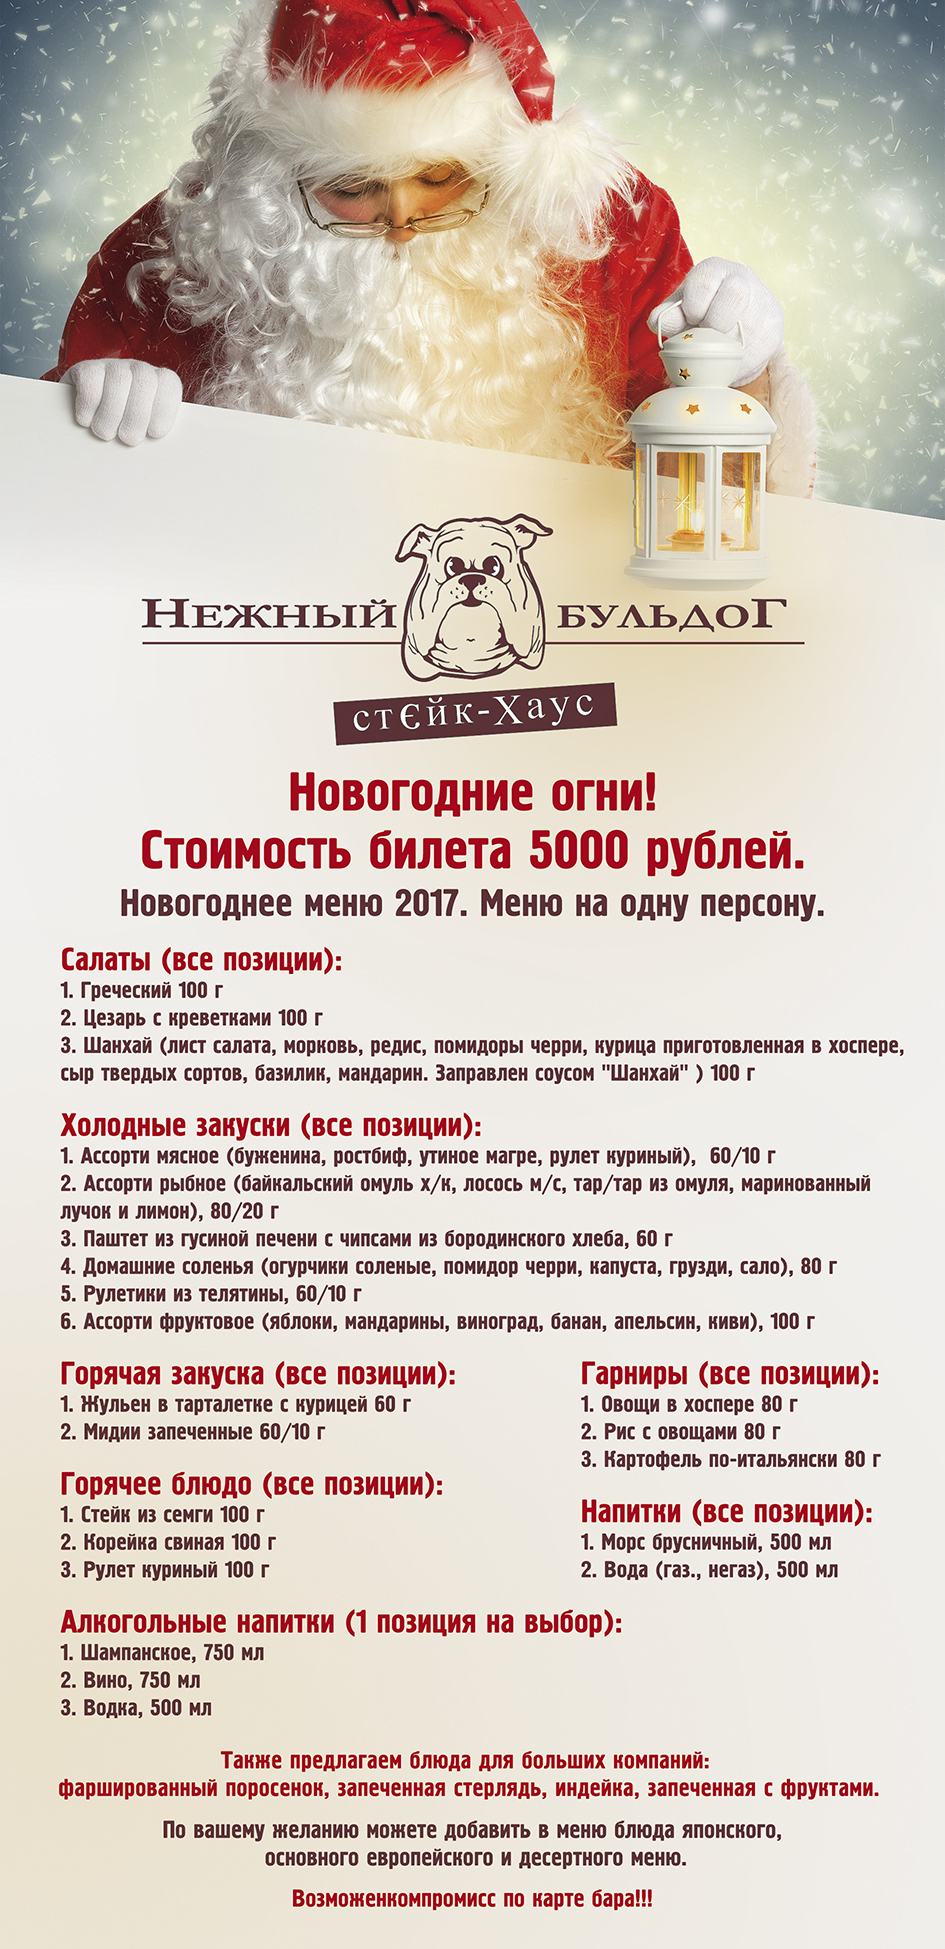 НБ_Нов. меню_5000 руб.jpg